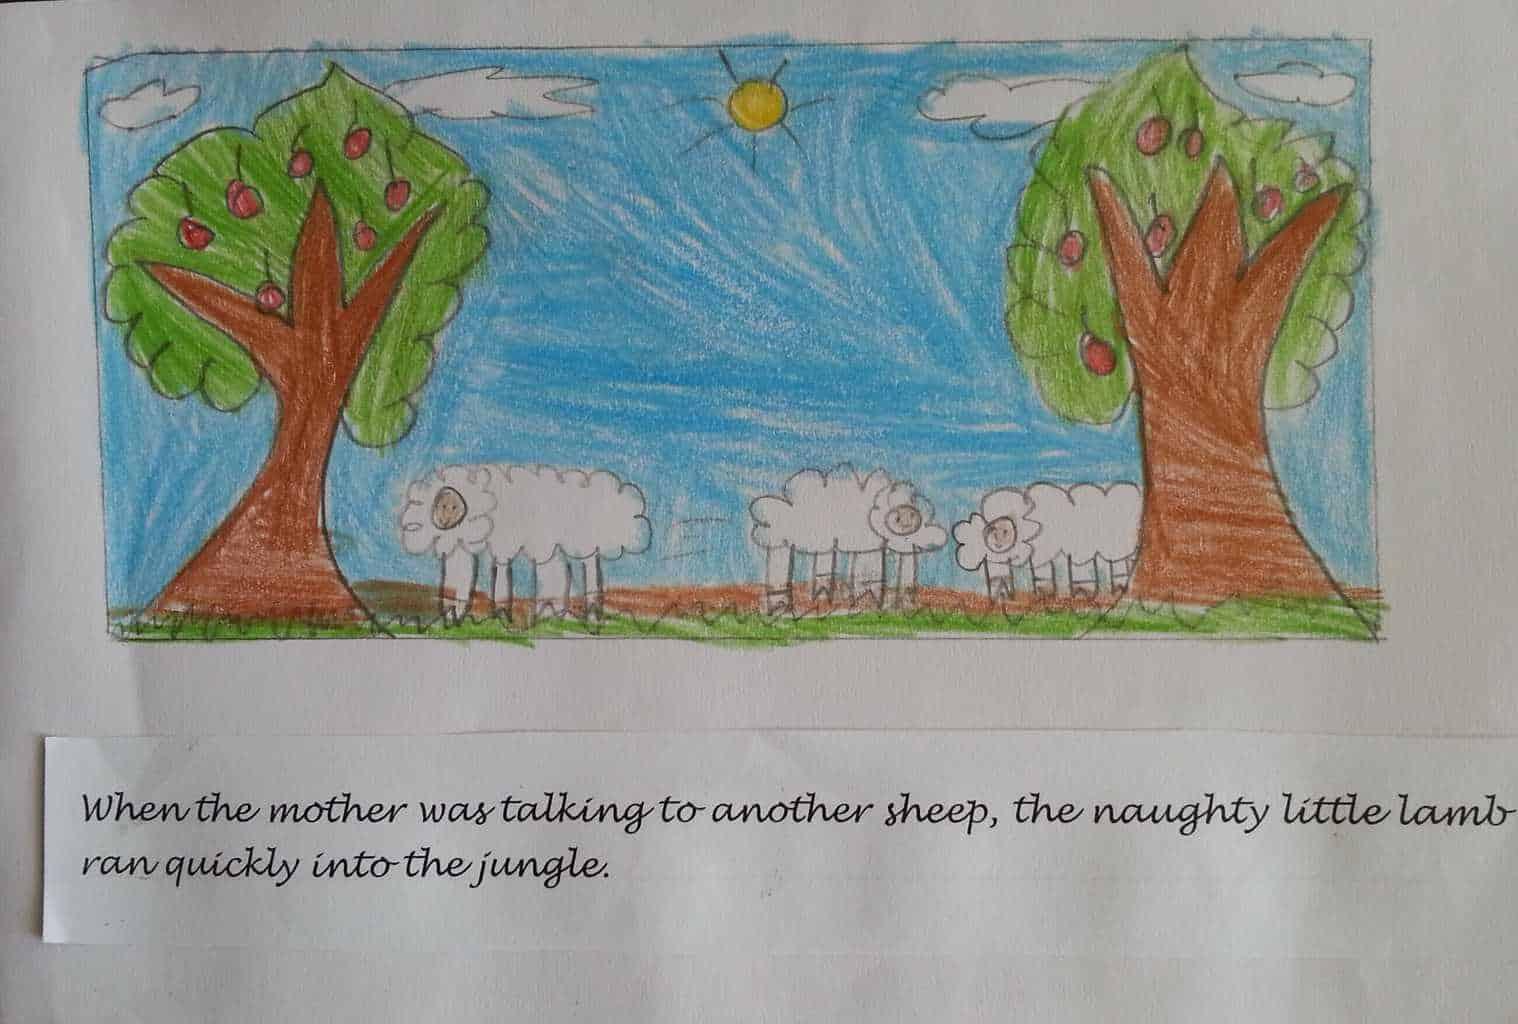 Dishita storybook